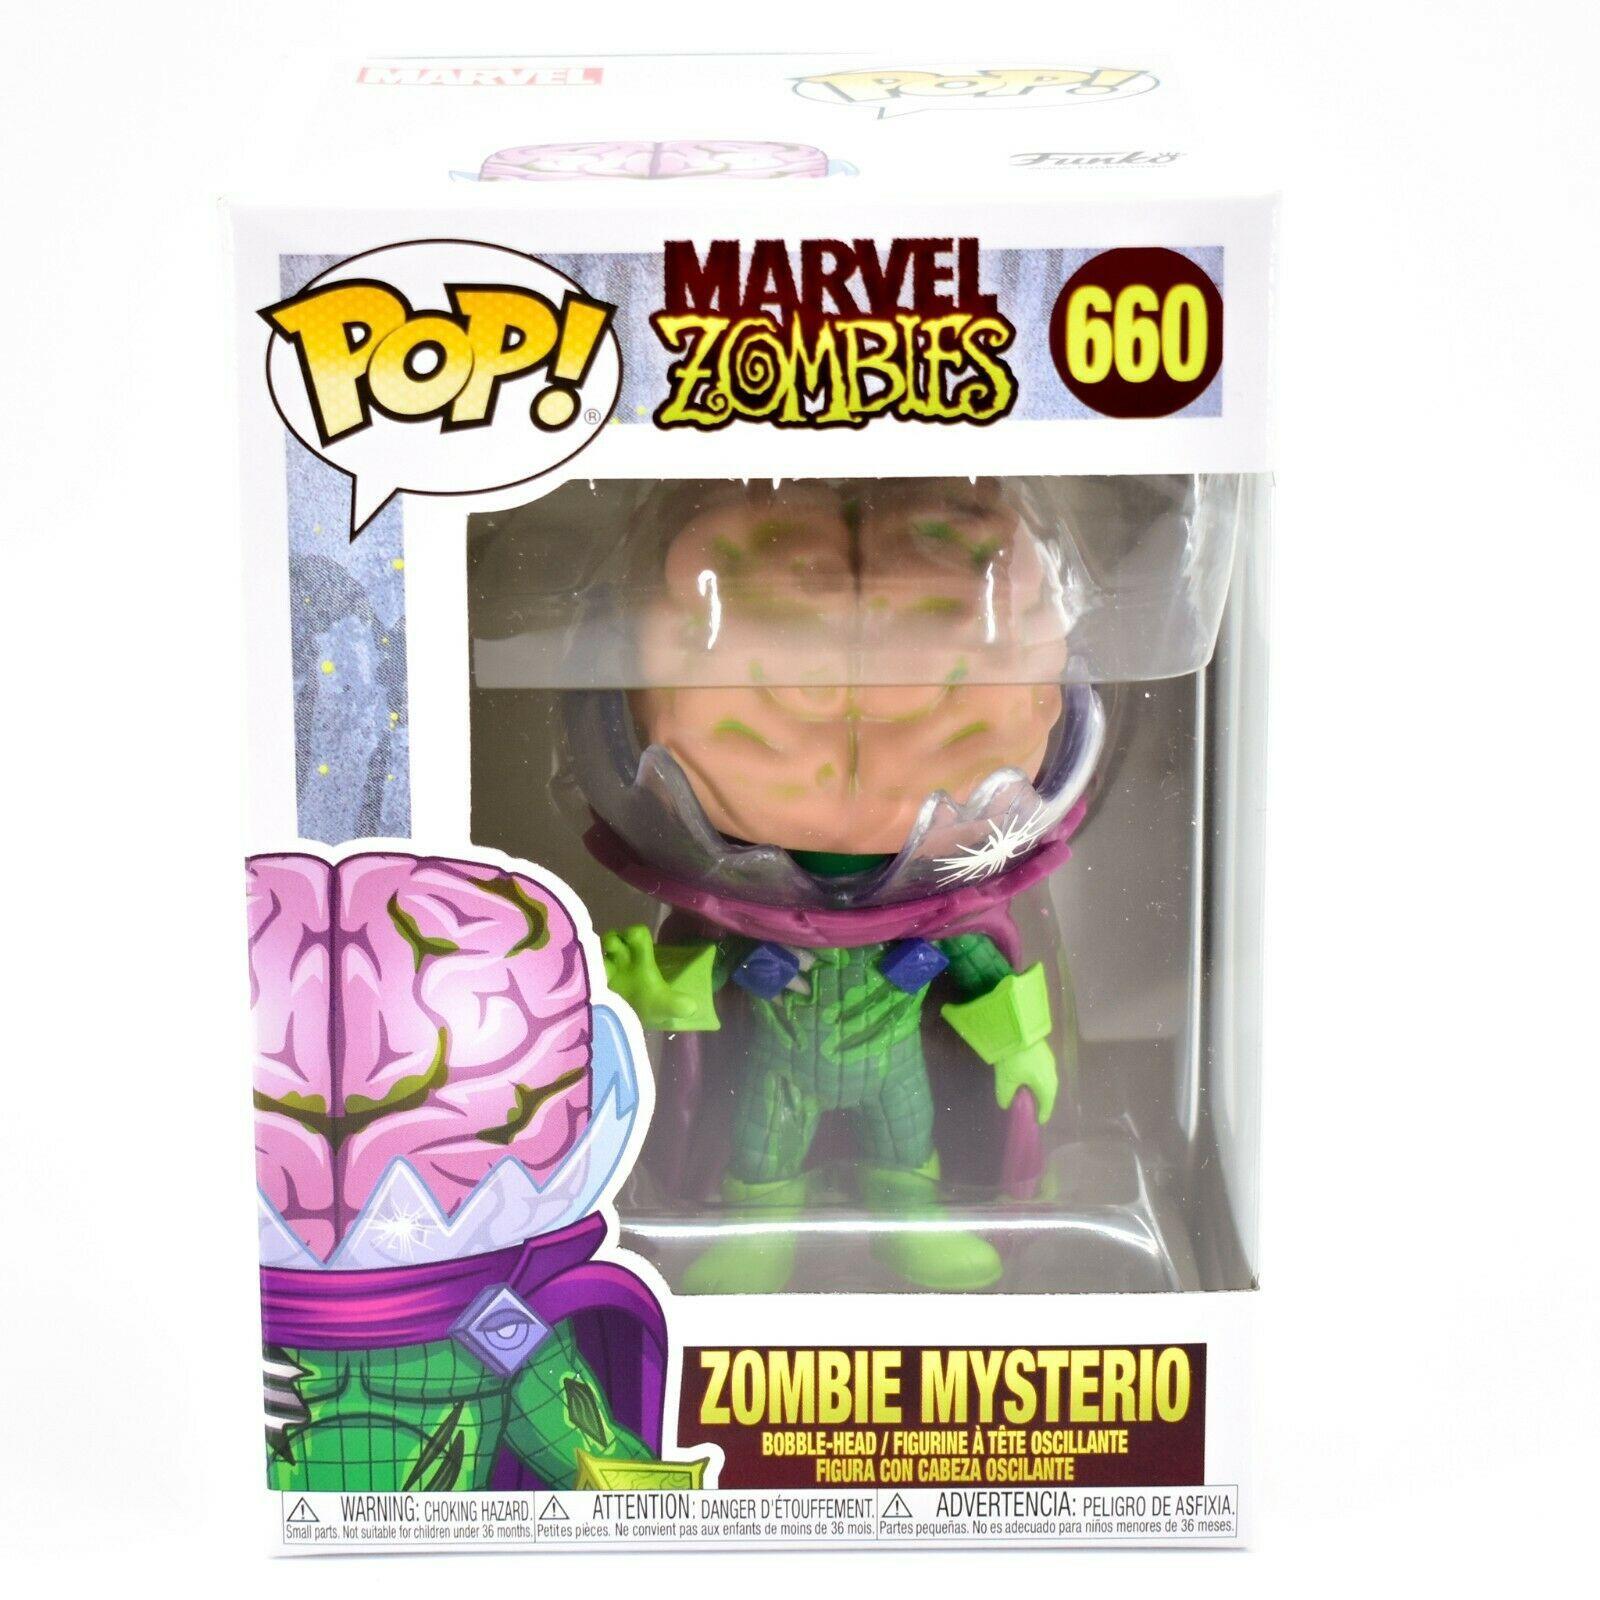 Funko Pop! Marvel Zombies Zombie Mysterio #660 Bobble Head Figure